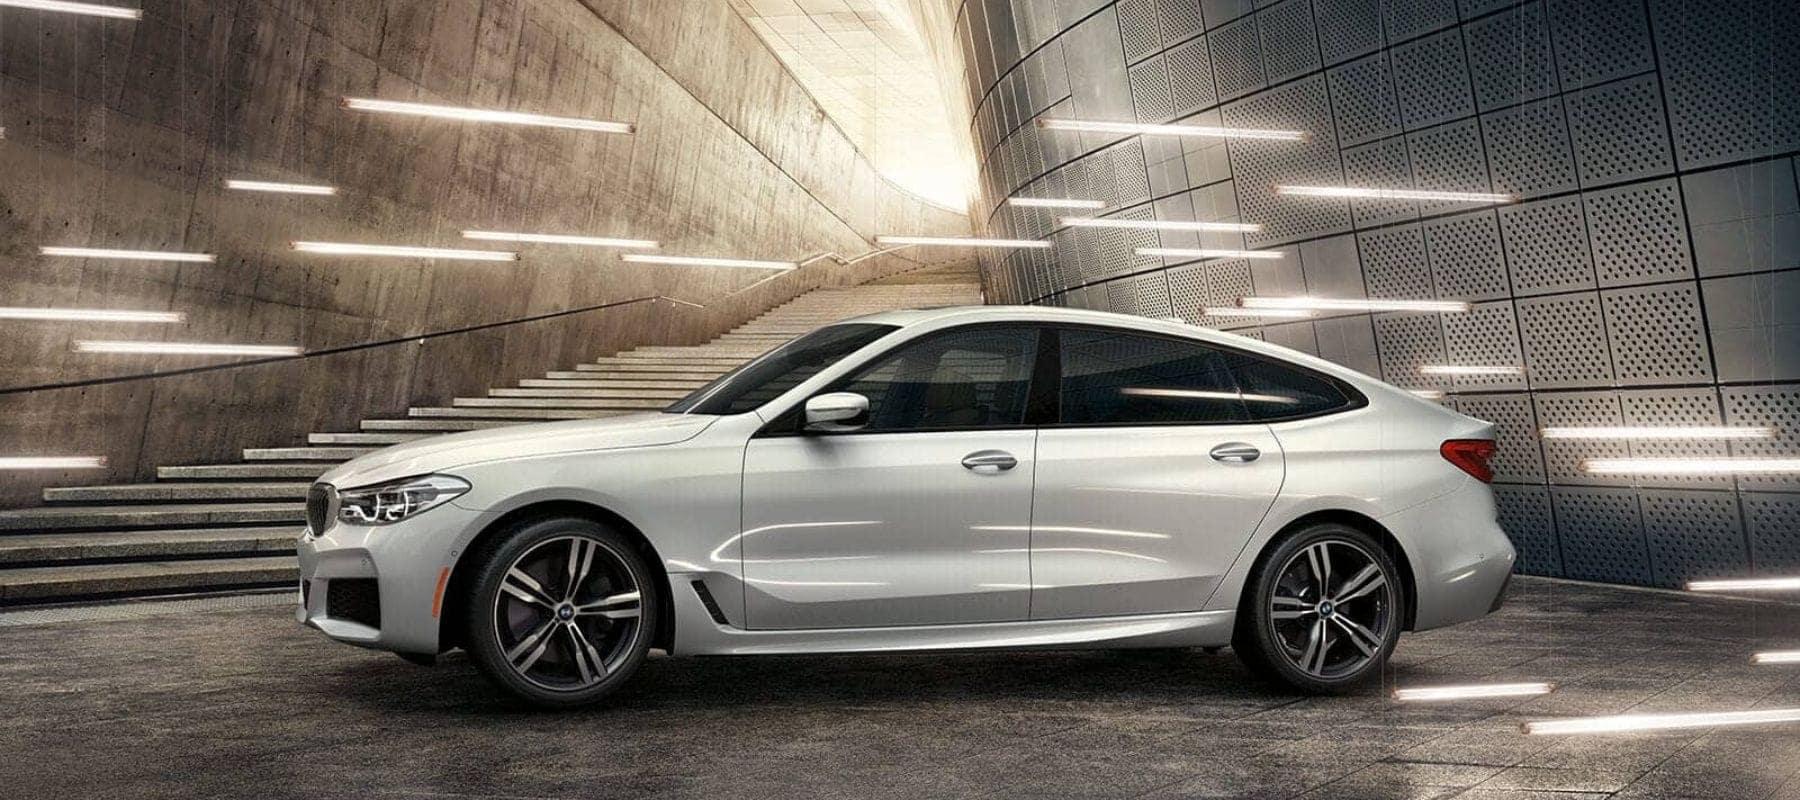 BMW 18 6 Series GT 1